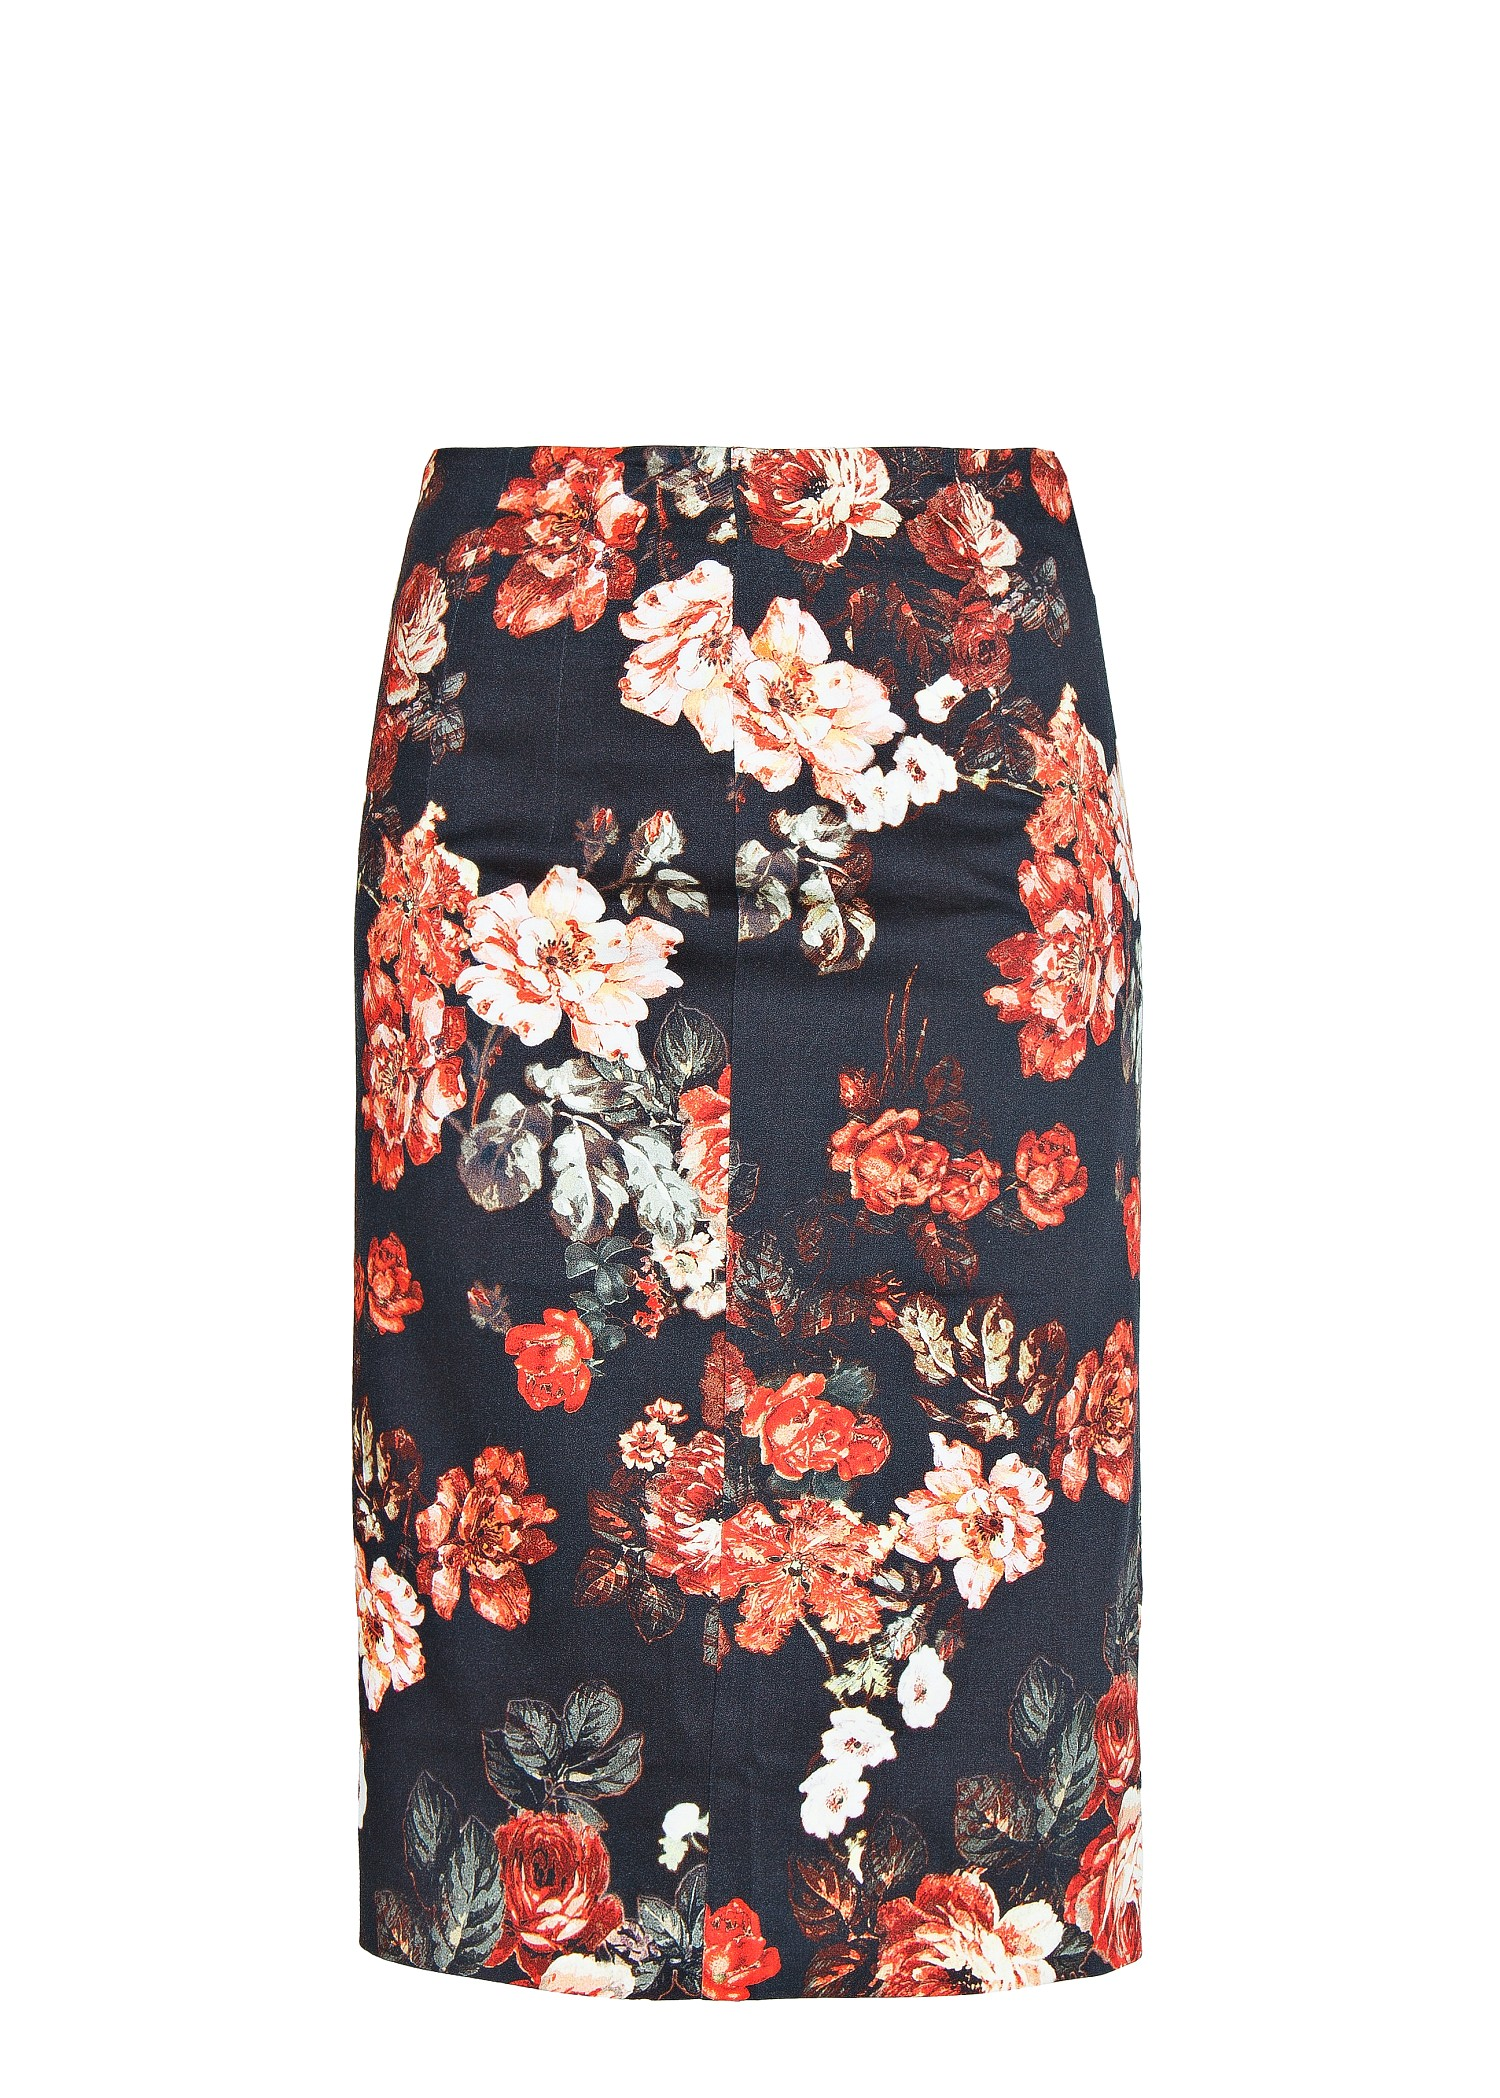 floral pencil skirt - photo #47